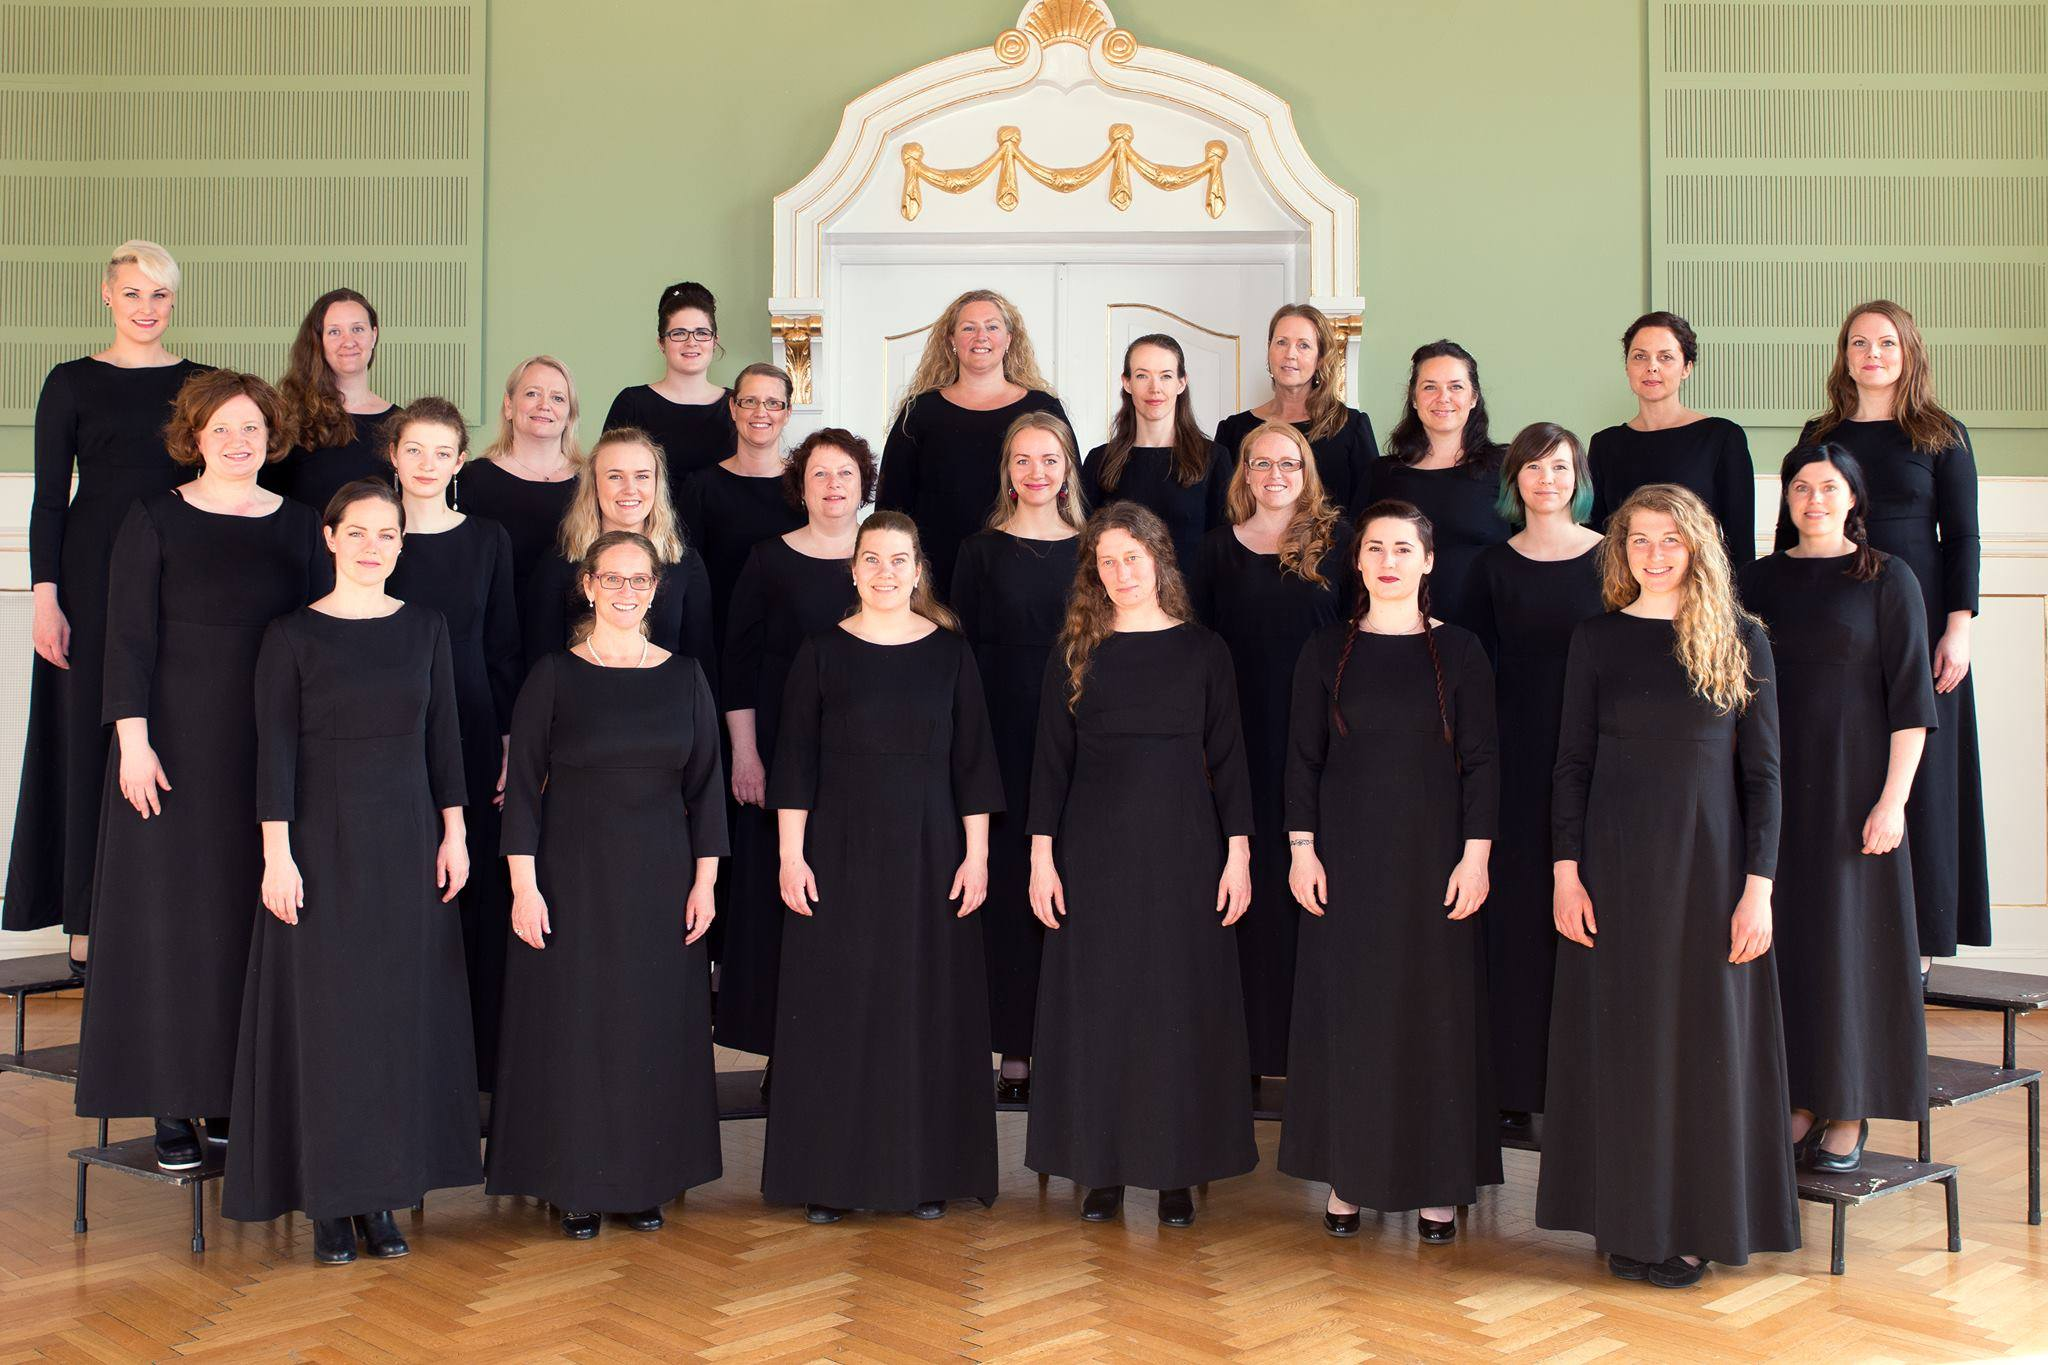 Tromsø Akademiske Kvinnekor - TAKk